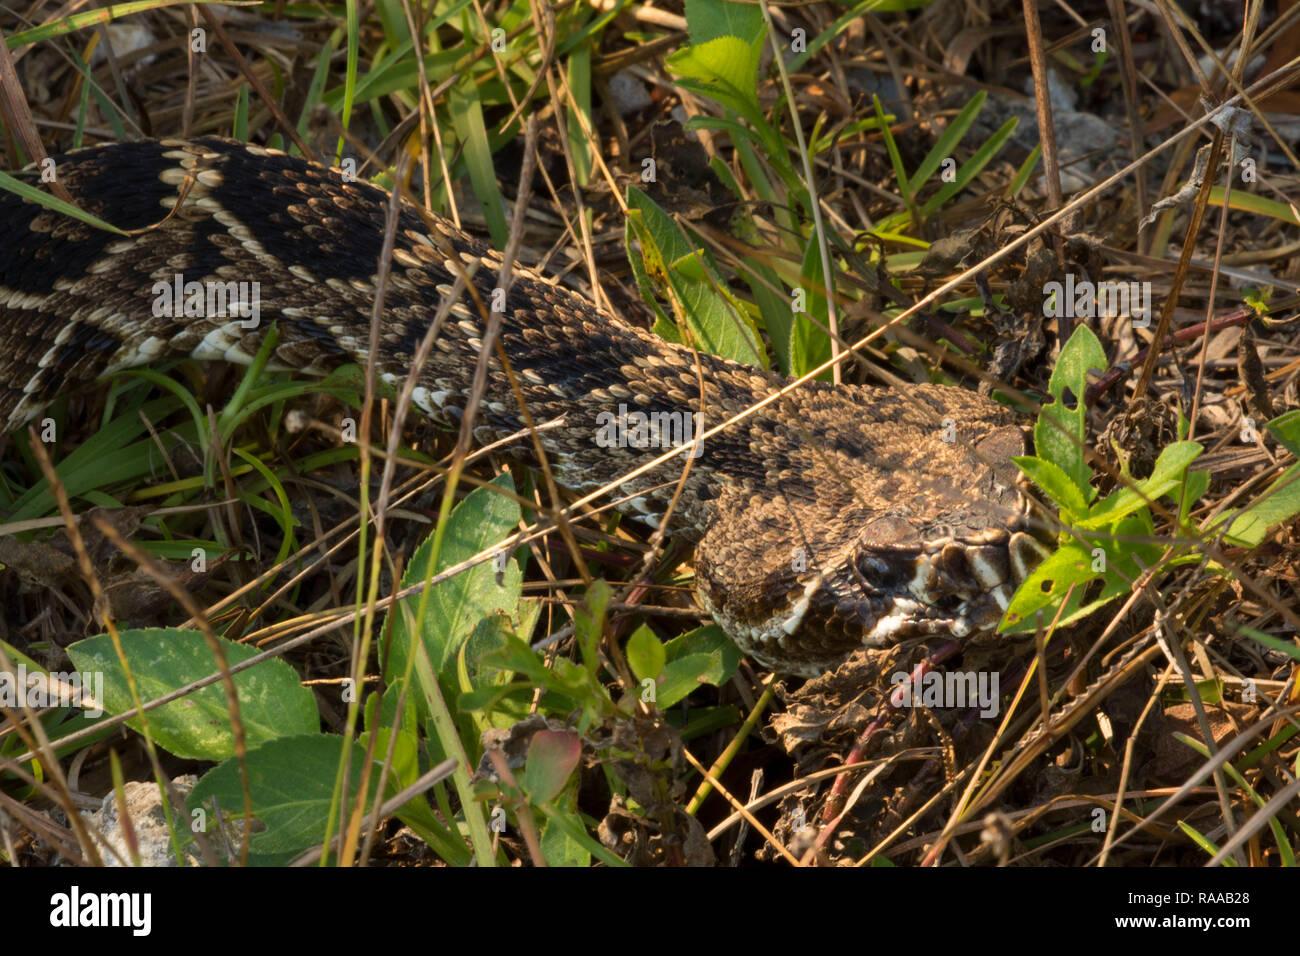 Eastern diamondback rattlesnake (Crotalus adamanteus), Everglades National Park, Florida Stock Photo